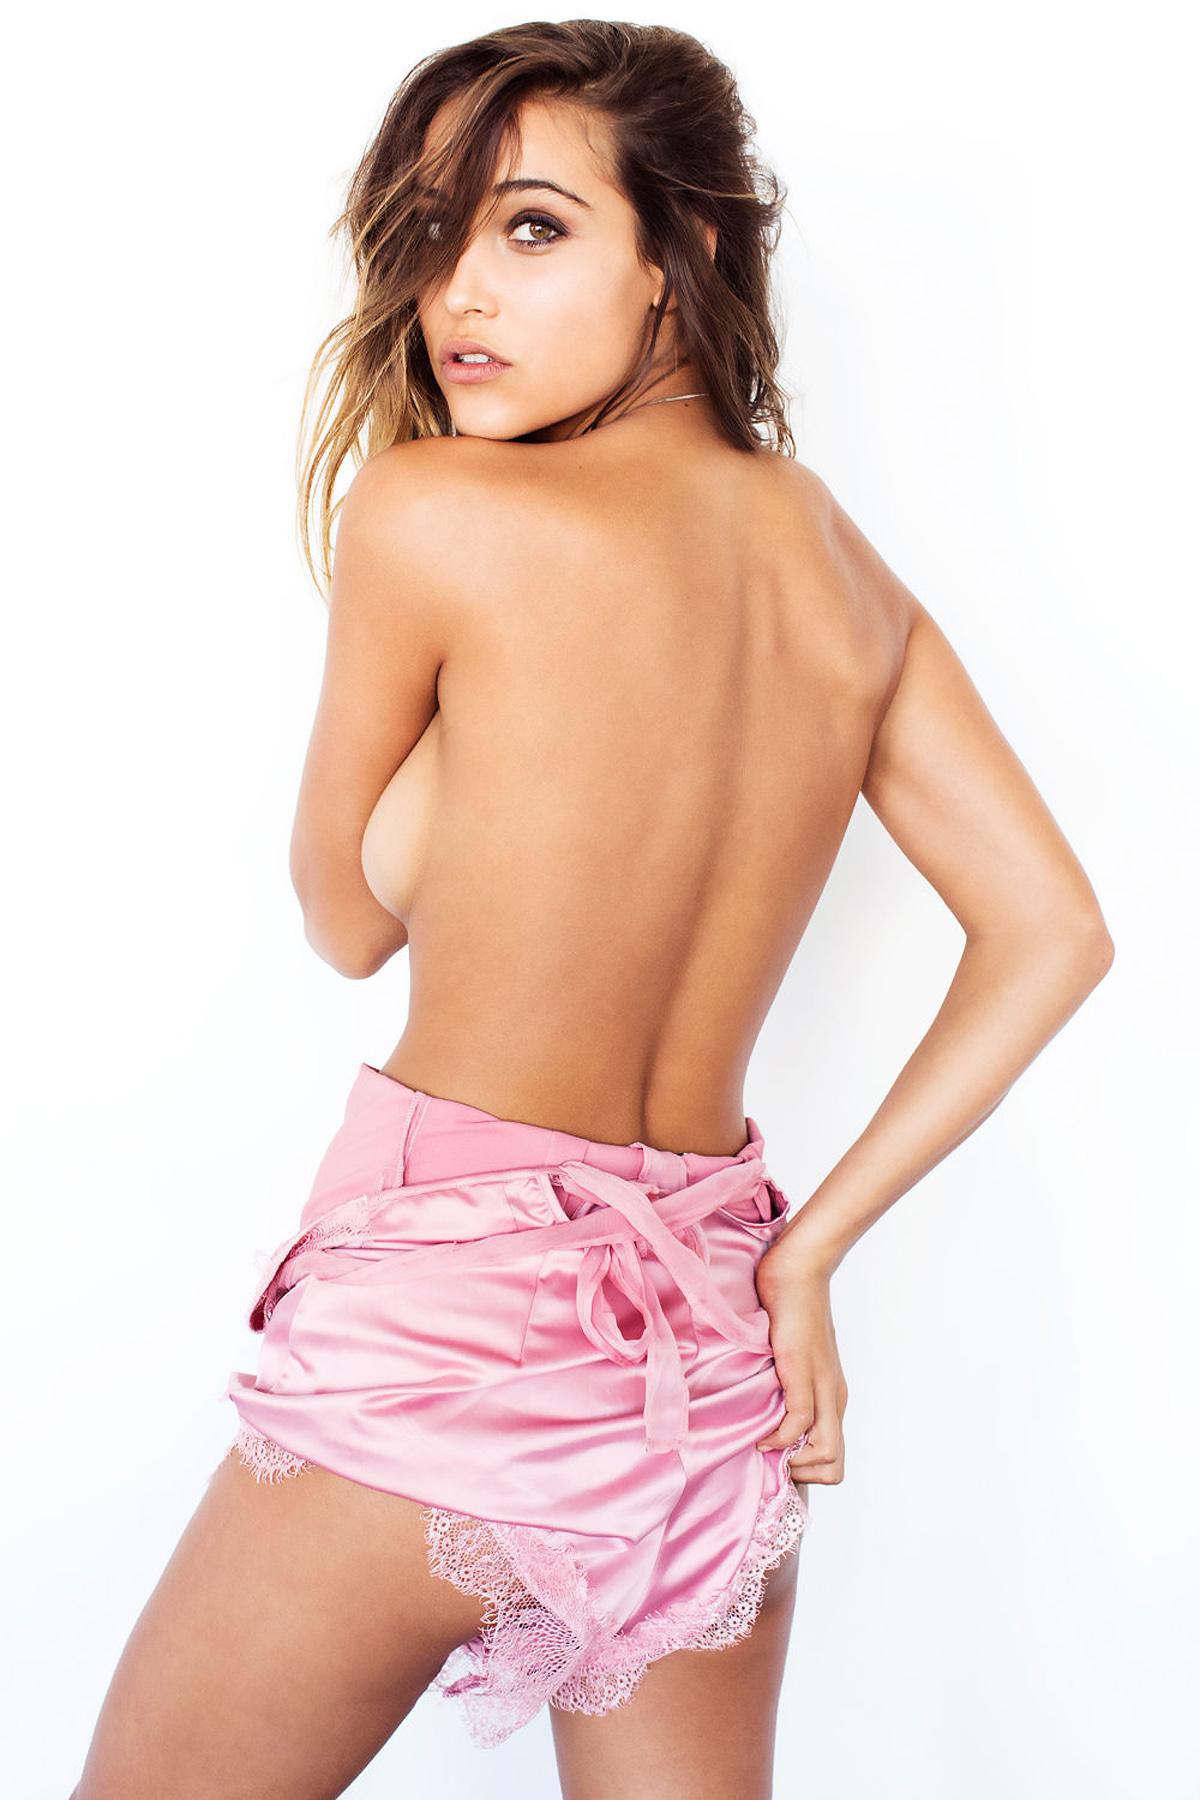 Sexy Pics Of Anna Herrin